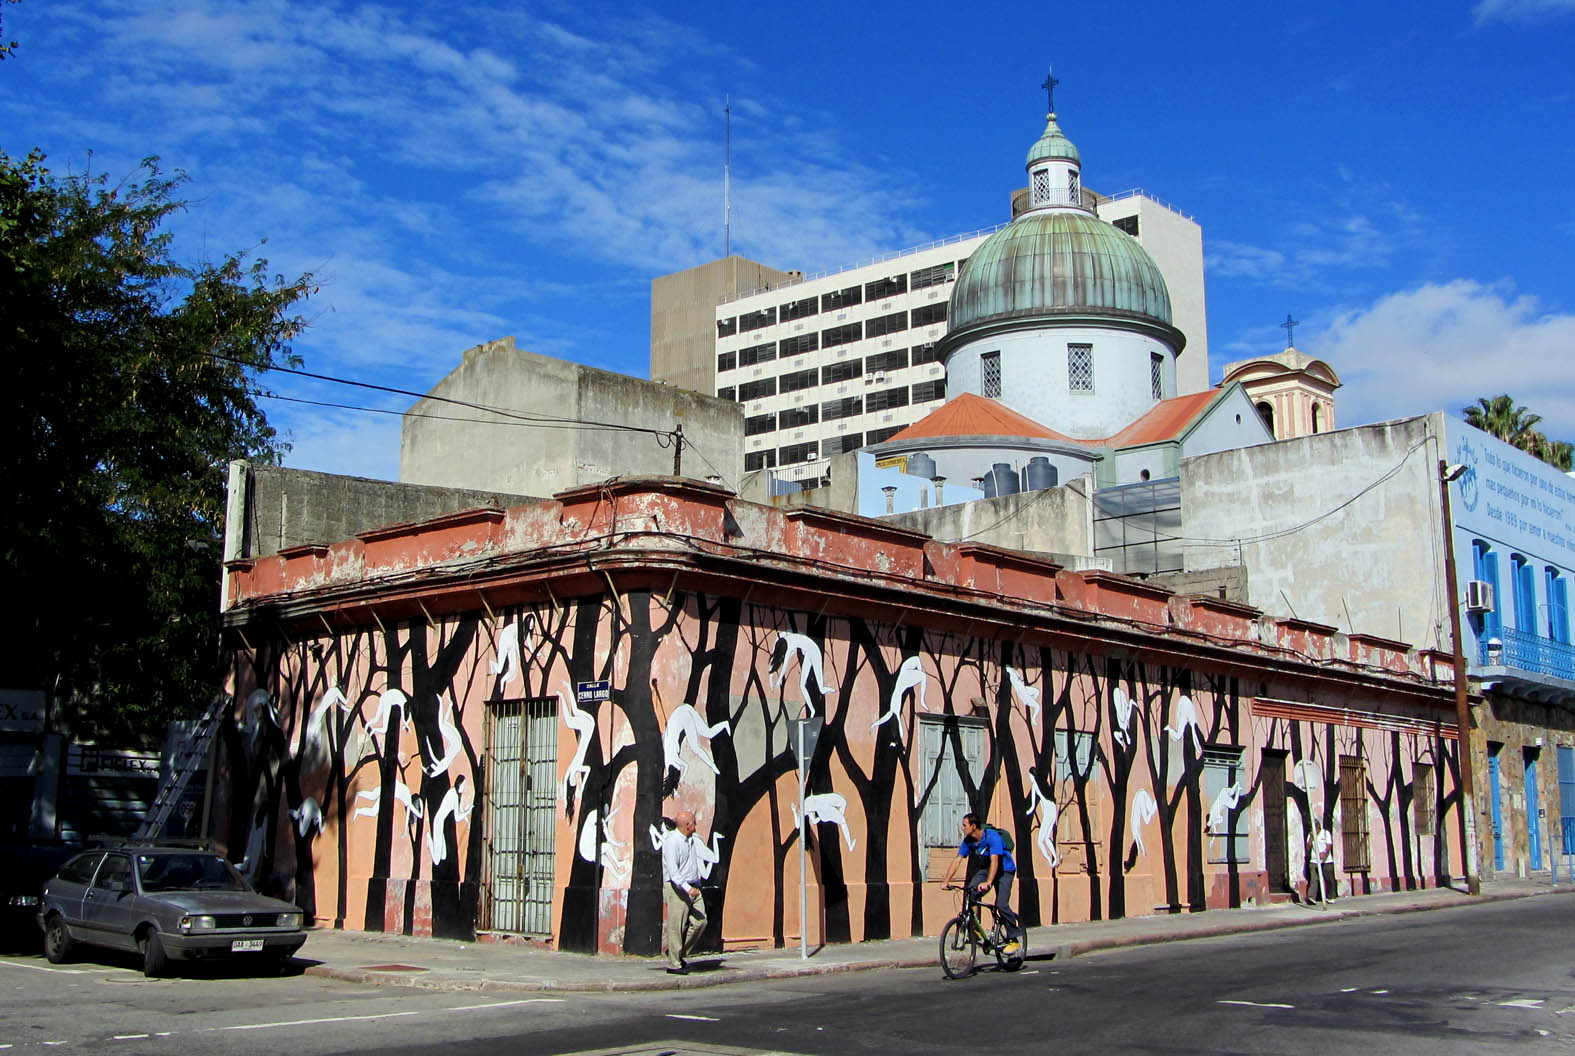 Urugvaj - Page 2 Street-art-in-uruguay-montevideo